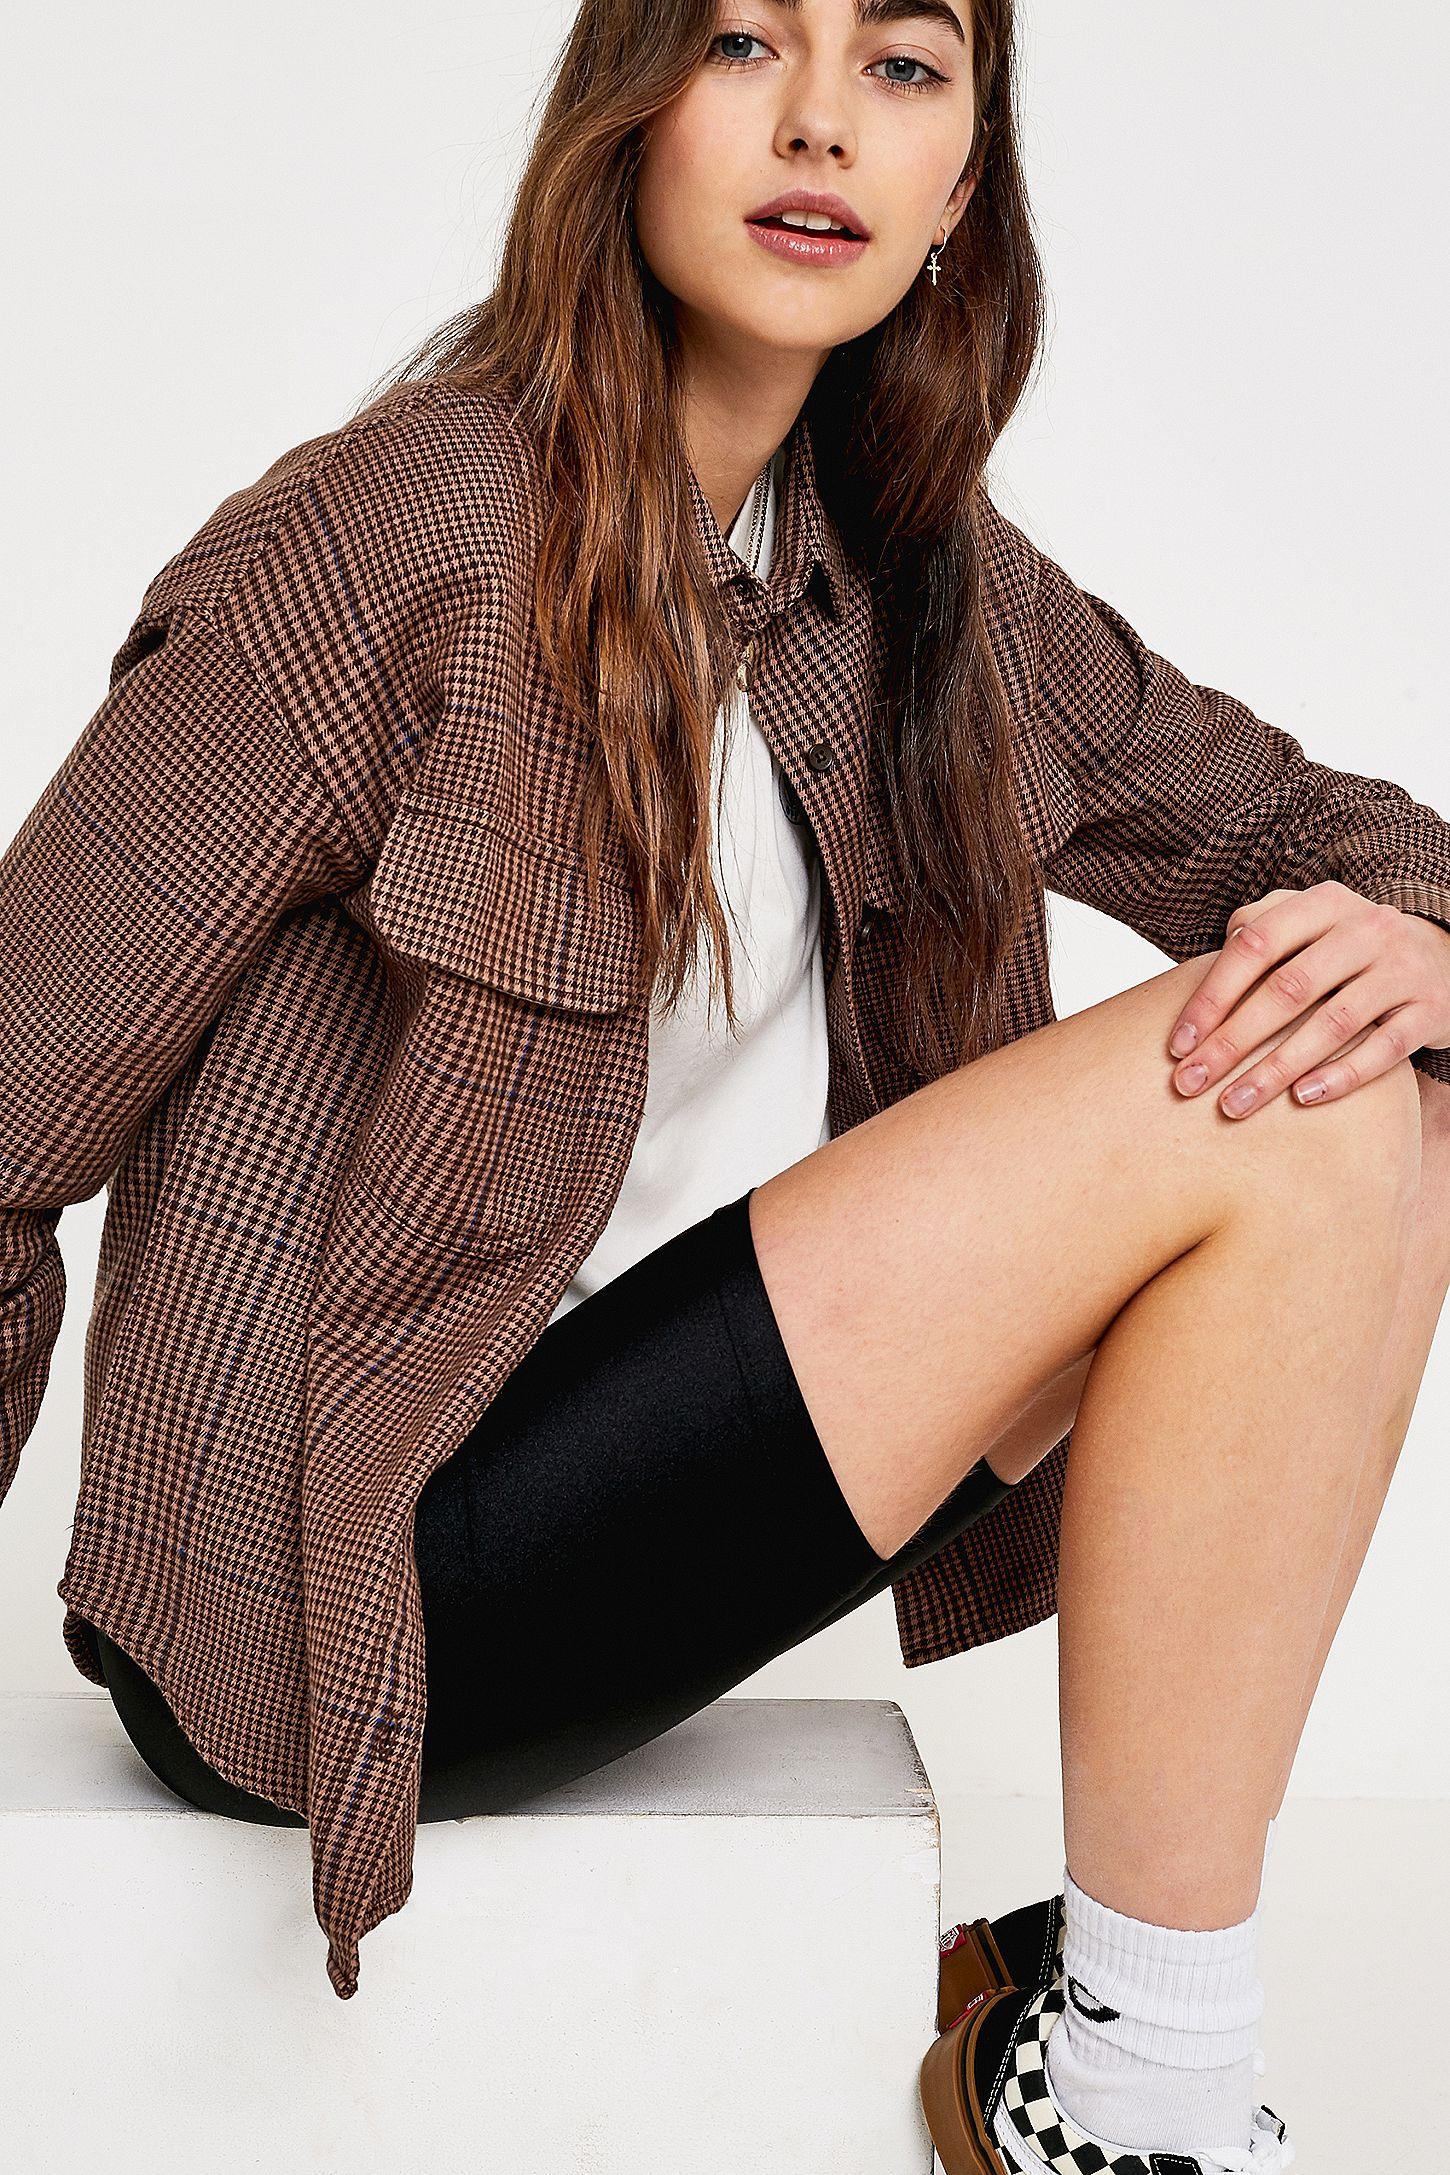 6716abb48a Vans Junction Woven Long-Sleeve Shirt | Urban Outfitters UK